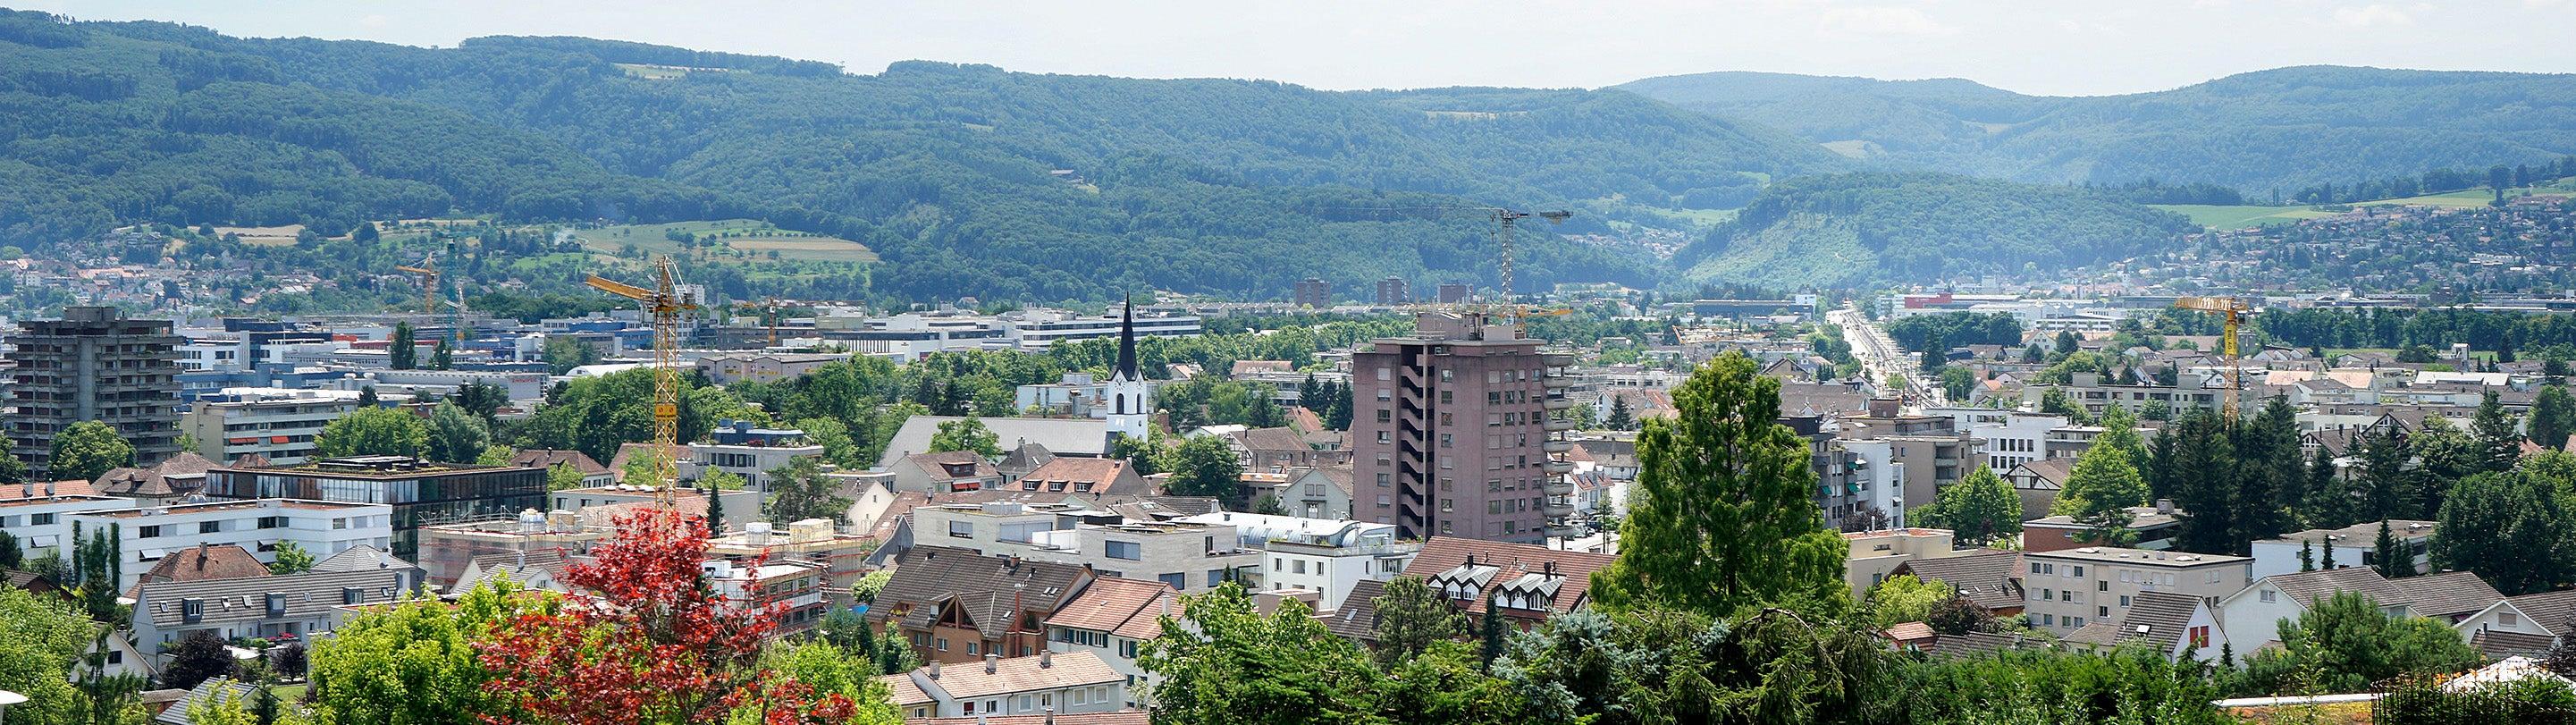 Reinach (BL)